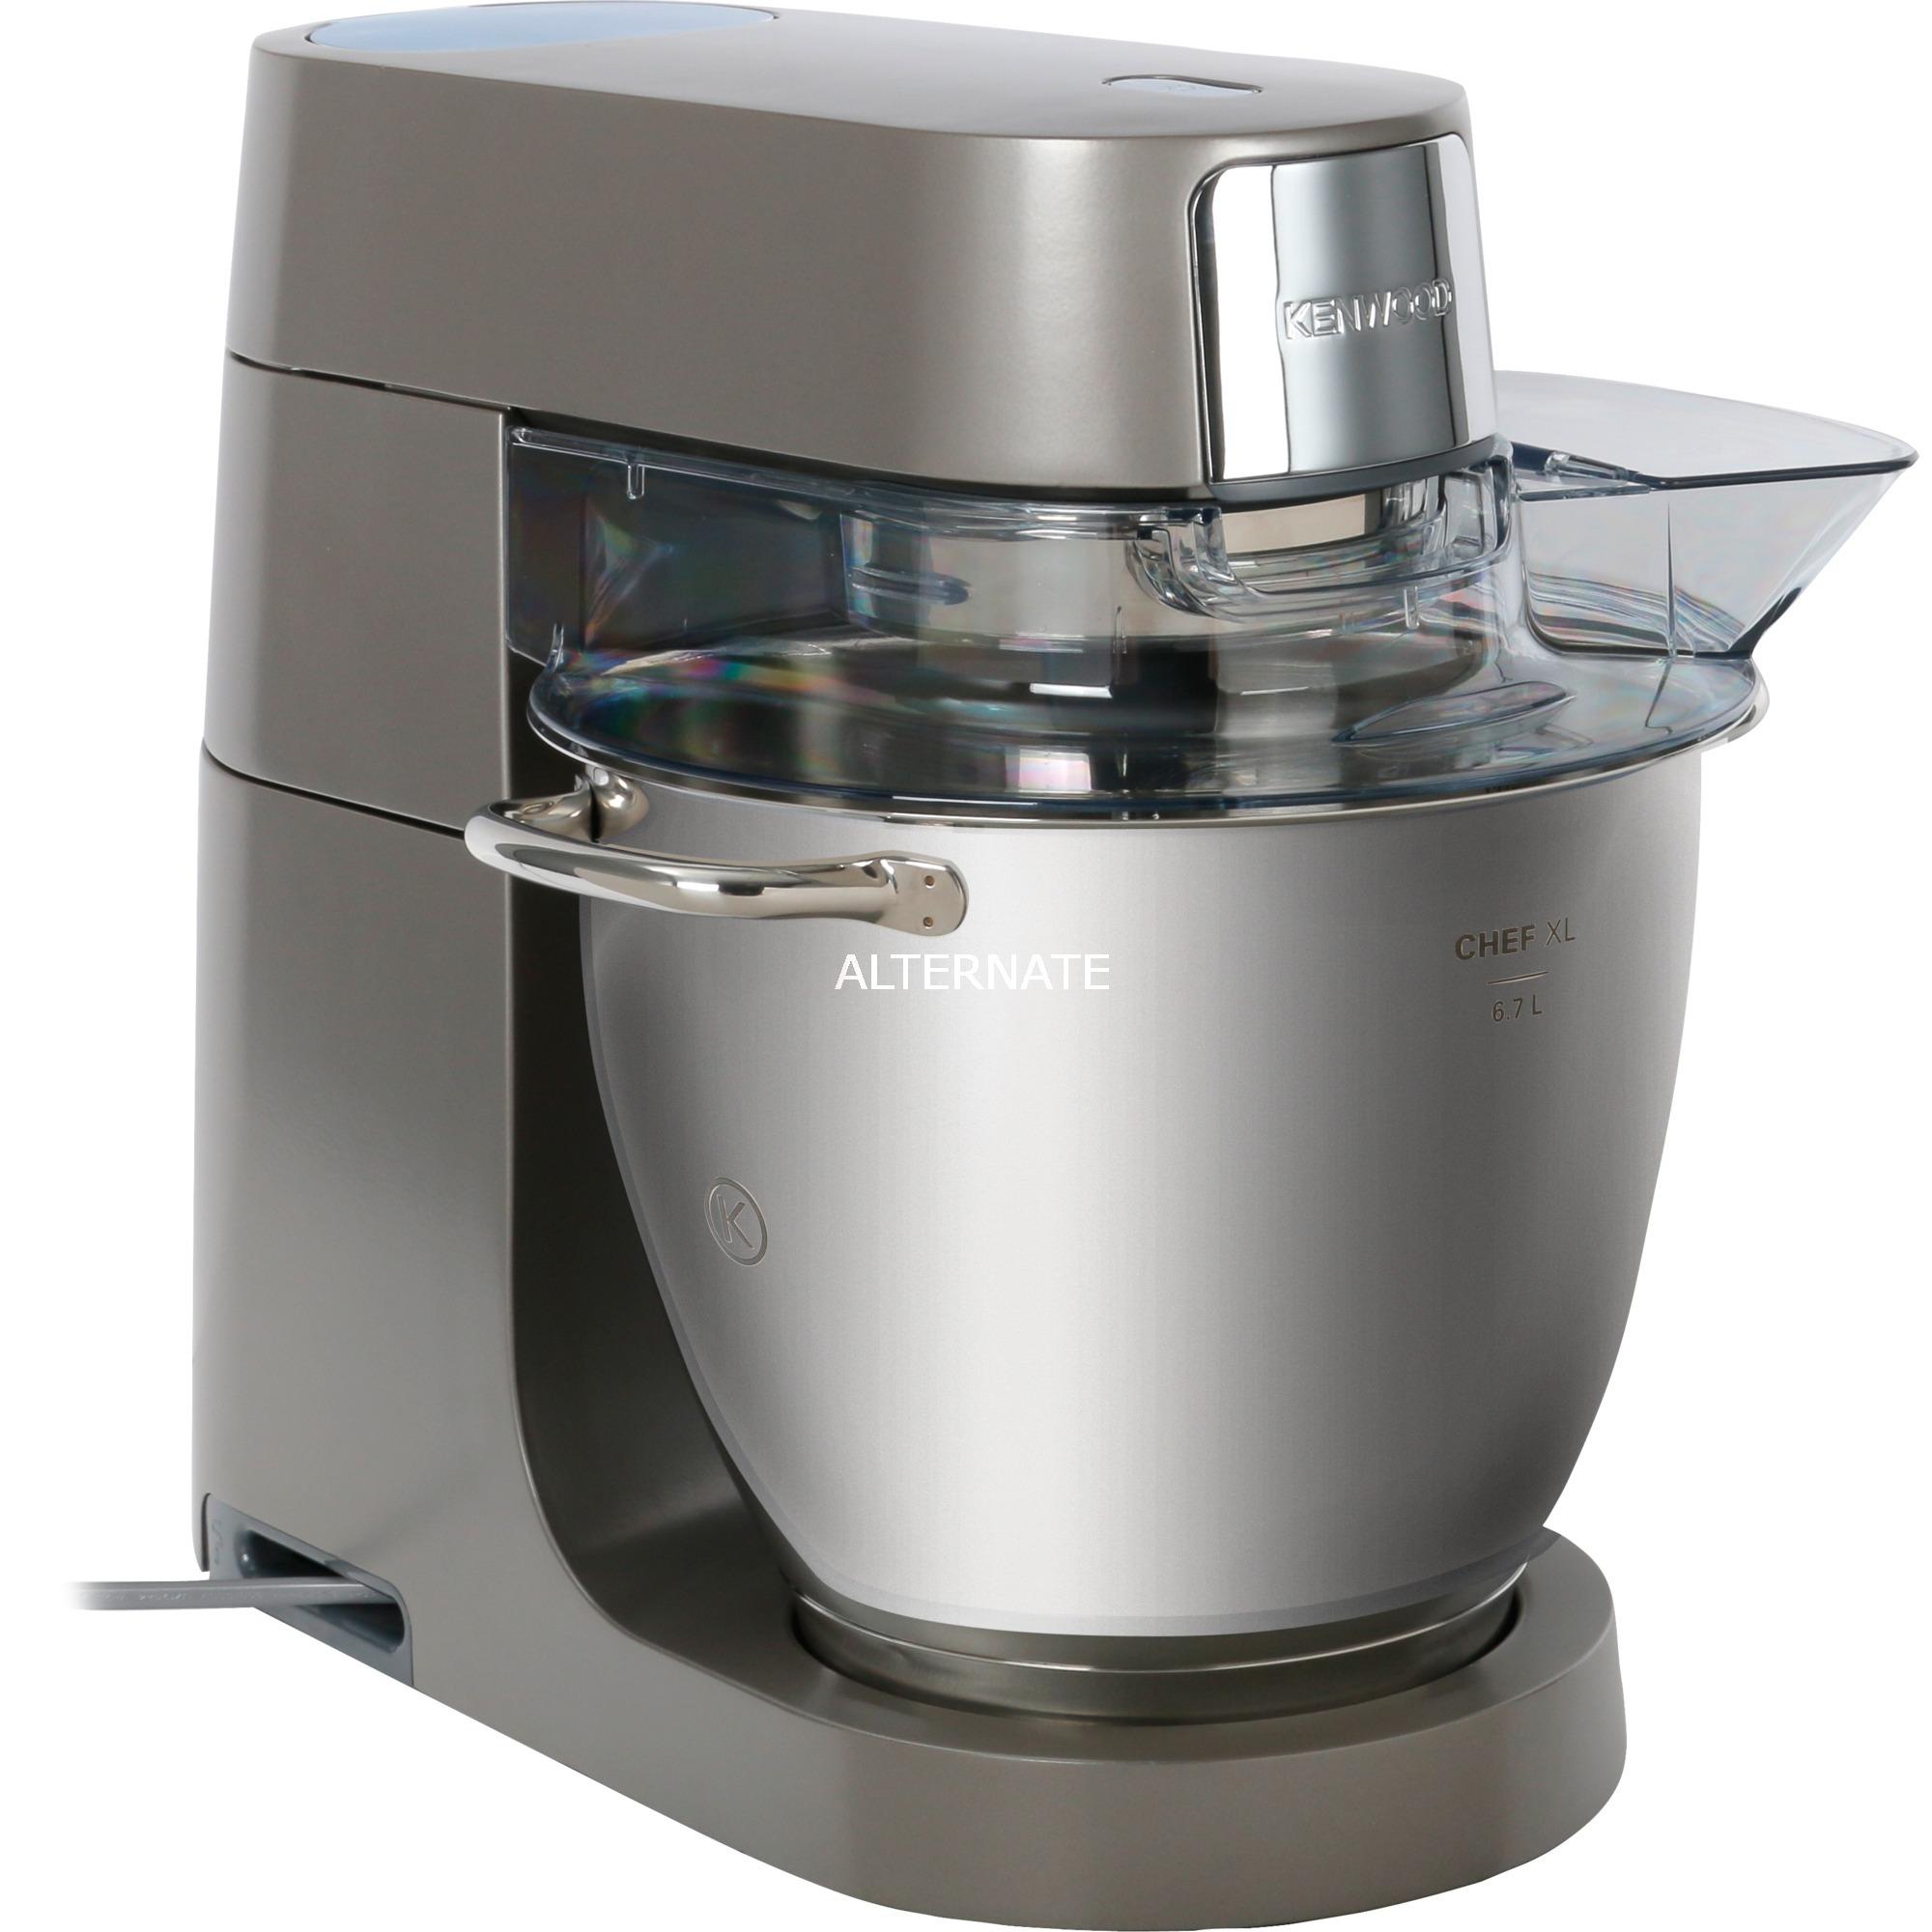 Chef XL KVL4110S Batidora de varillas Plata 1200 W, Robot de cocina